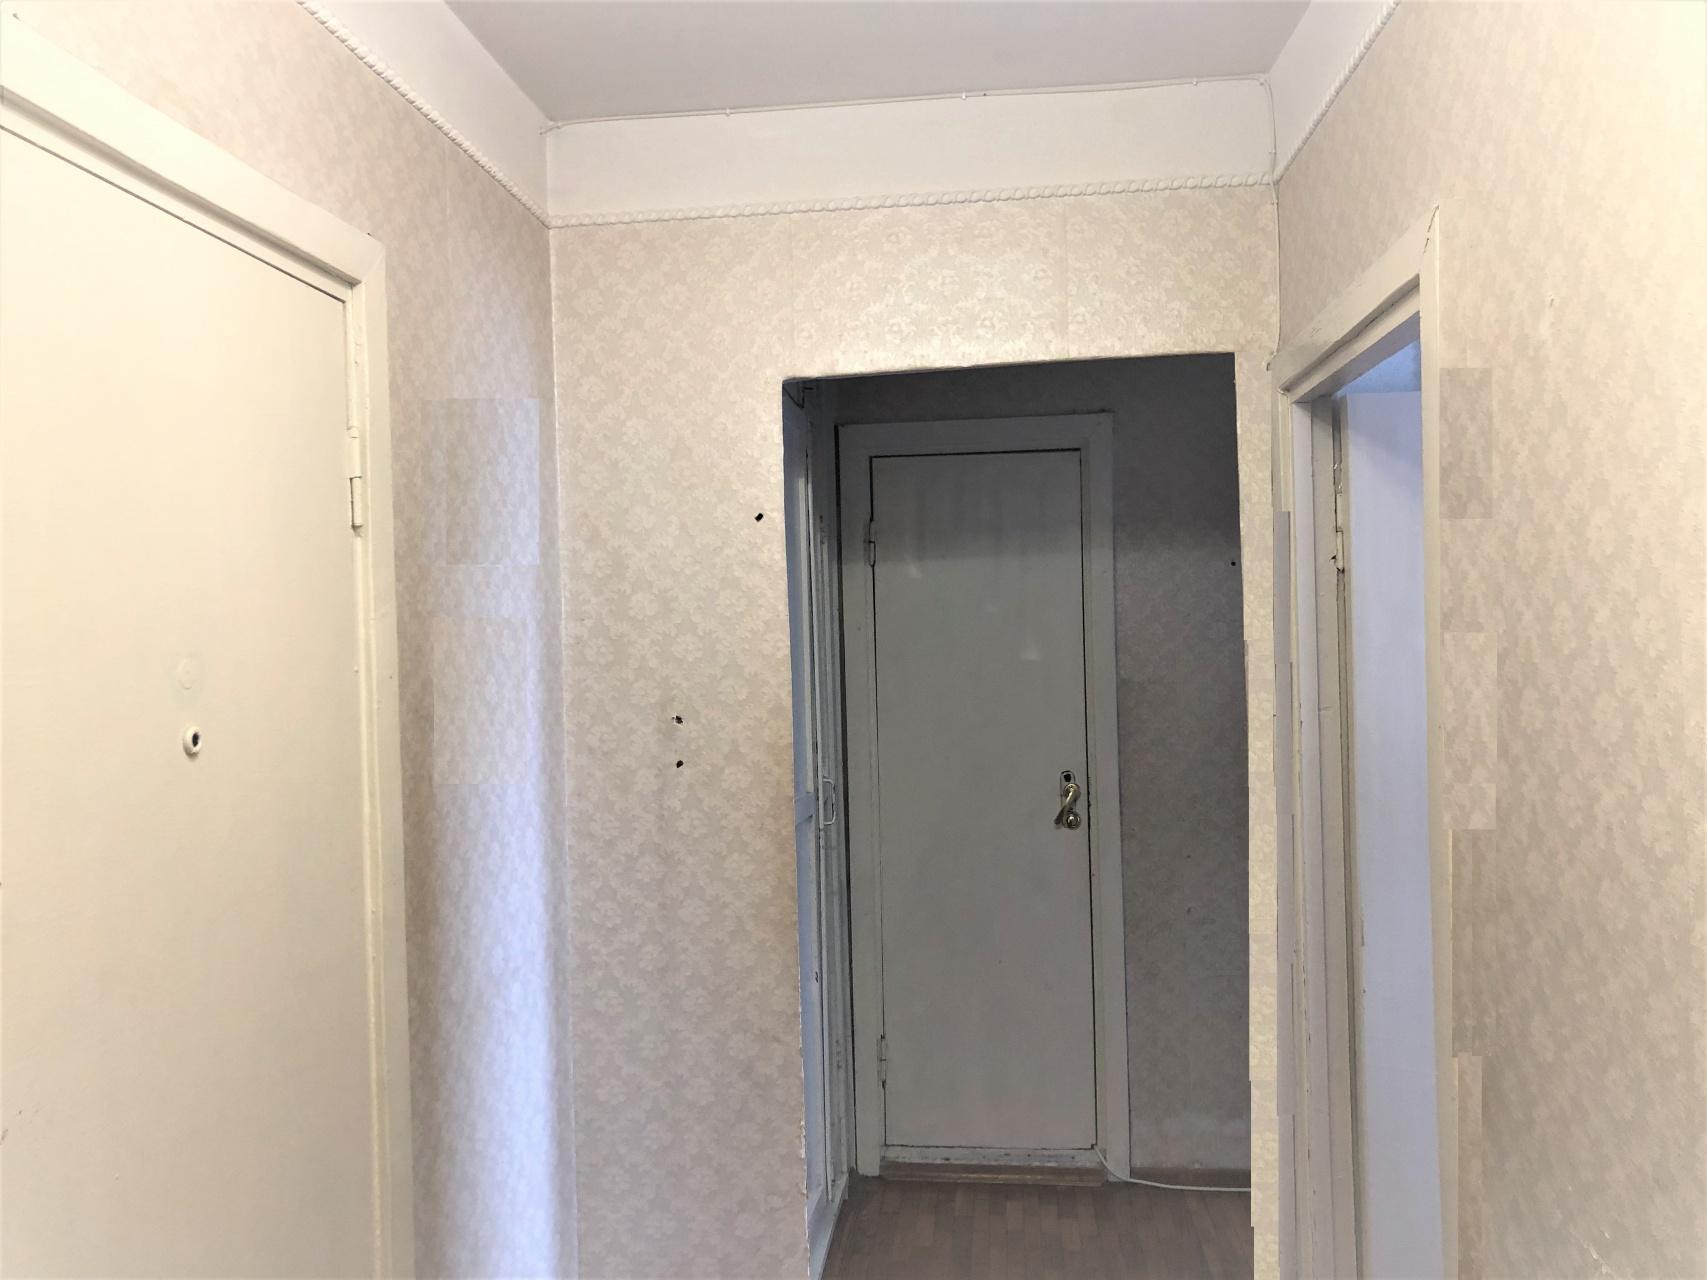 Квартира 2 комнатная в г. Майкоп район Черемушки